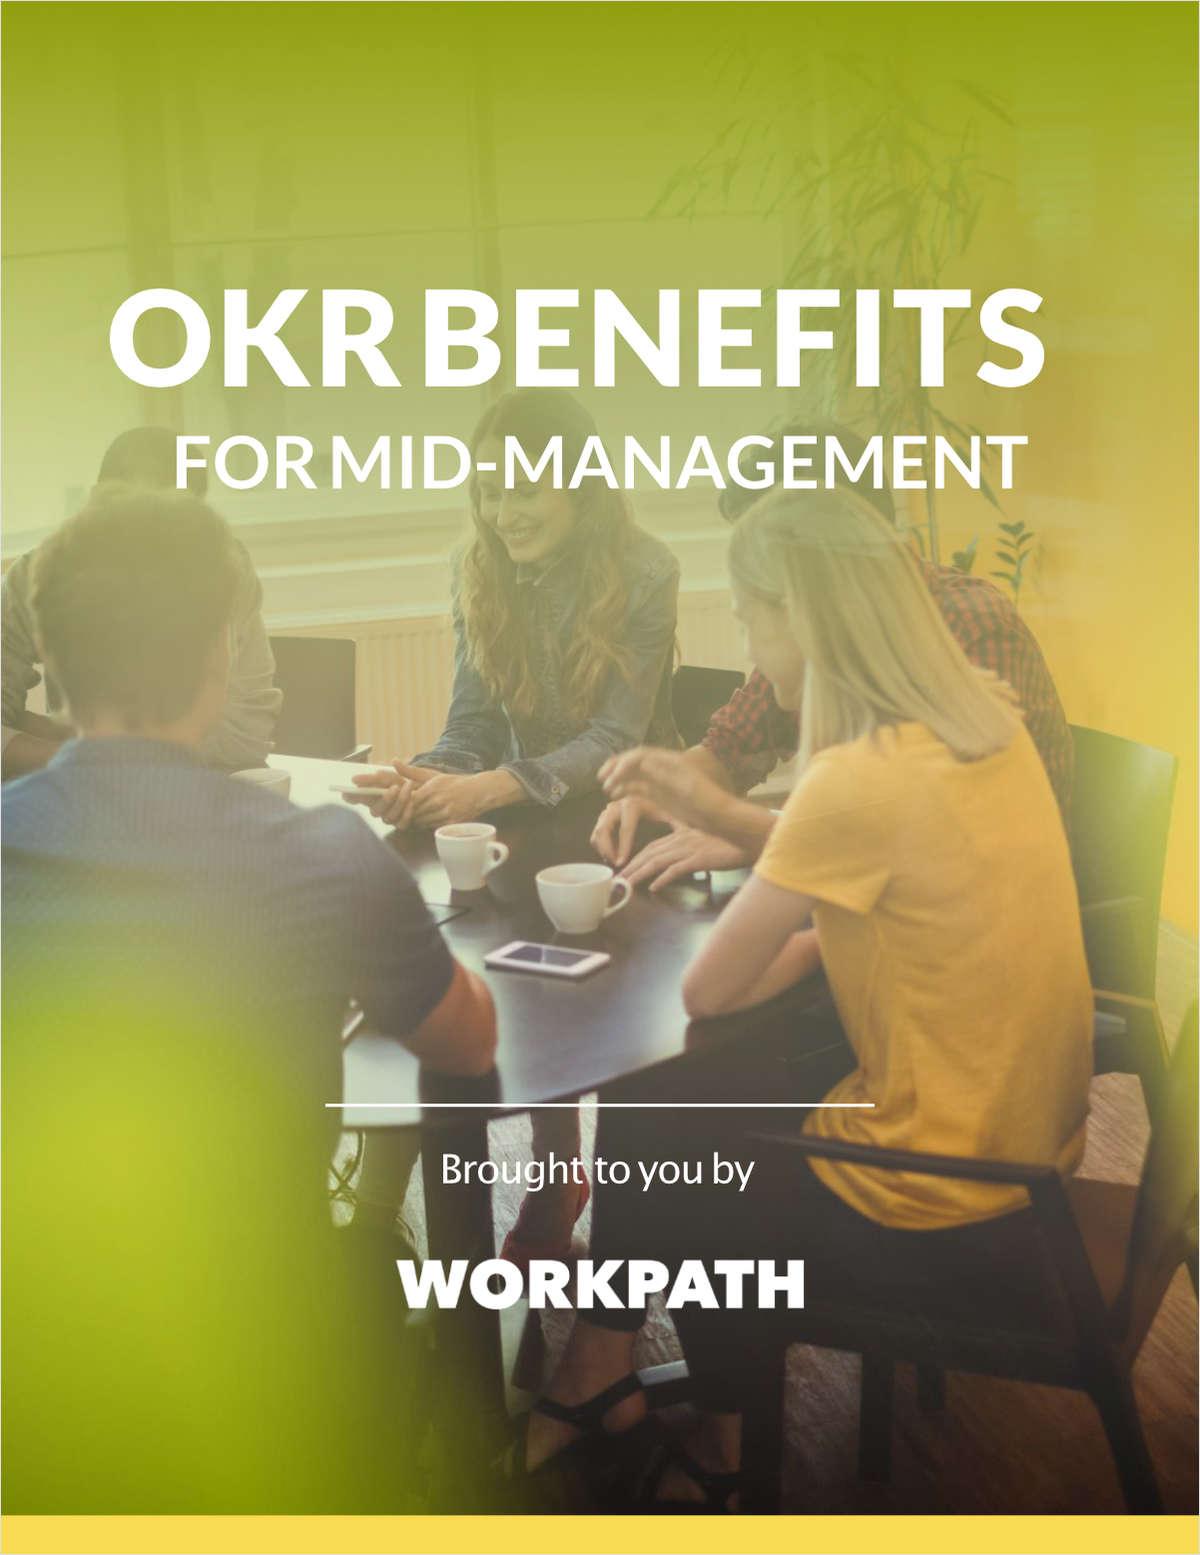 OKR Benefits for Mid-Management